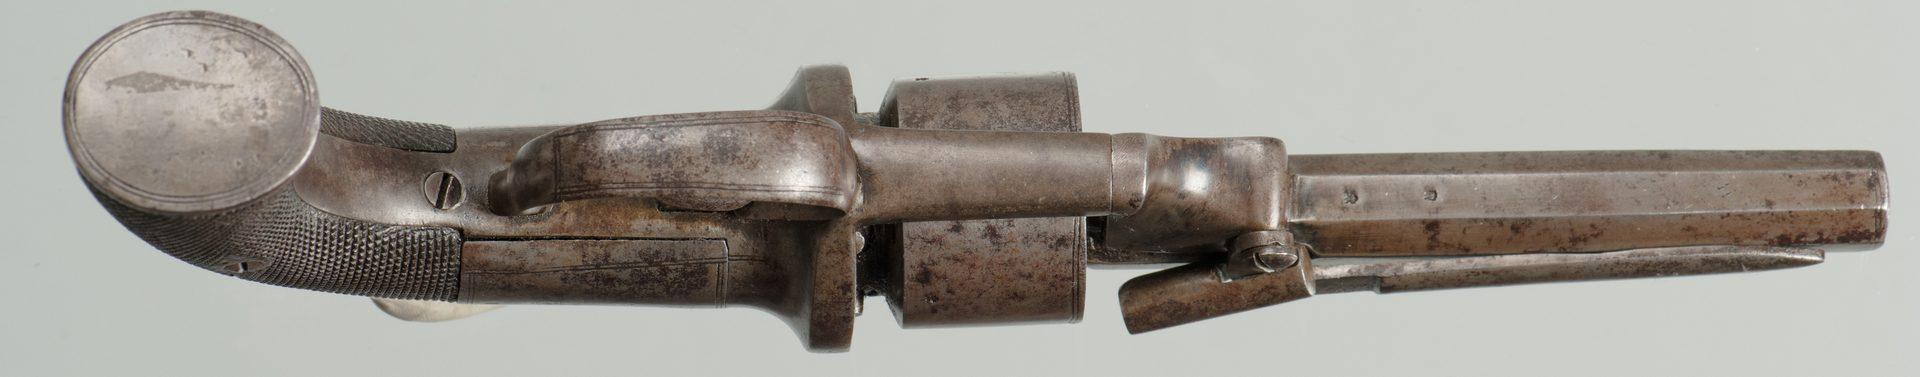 Lot 237: European Transition Revolver, 36 Cal.